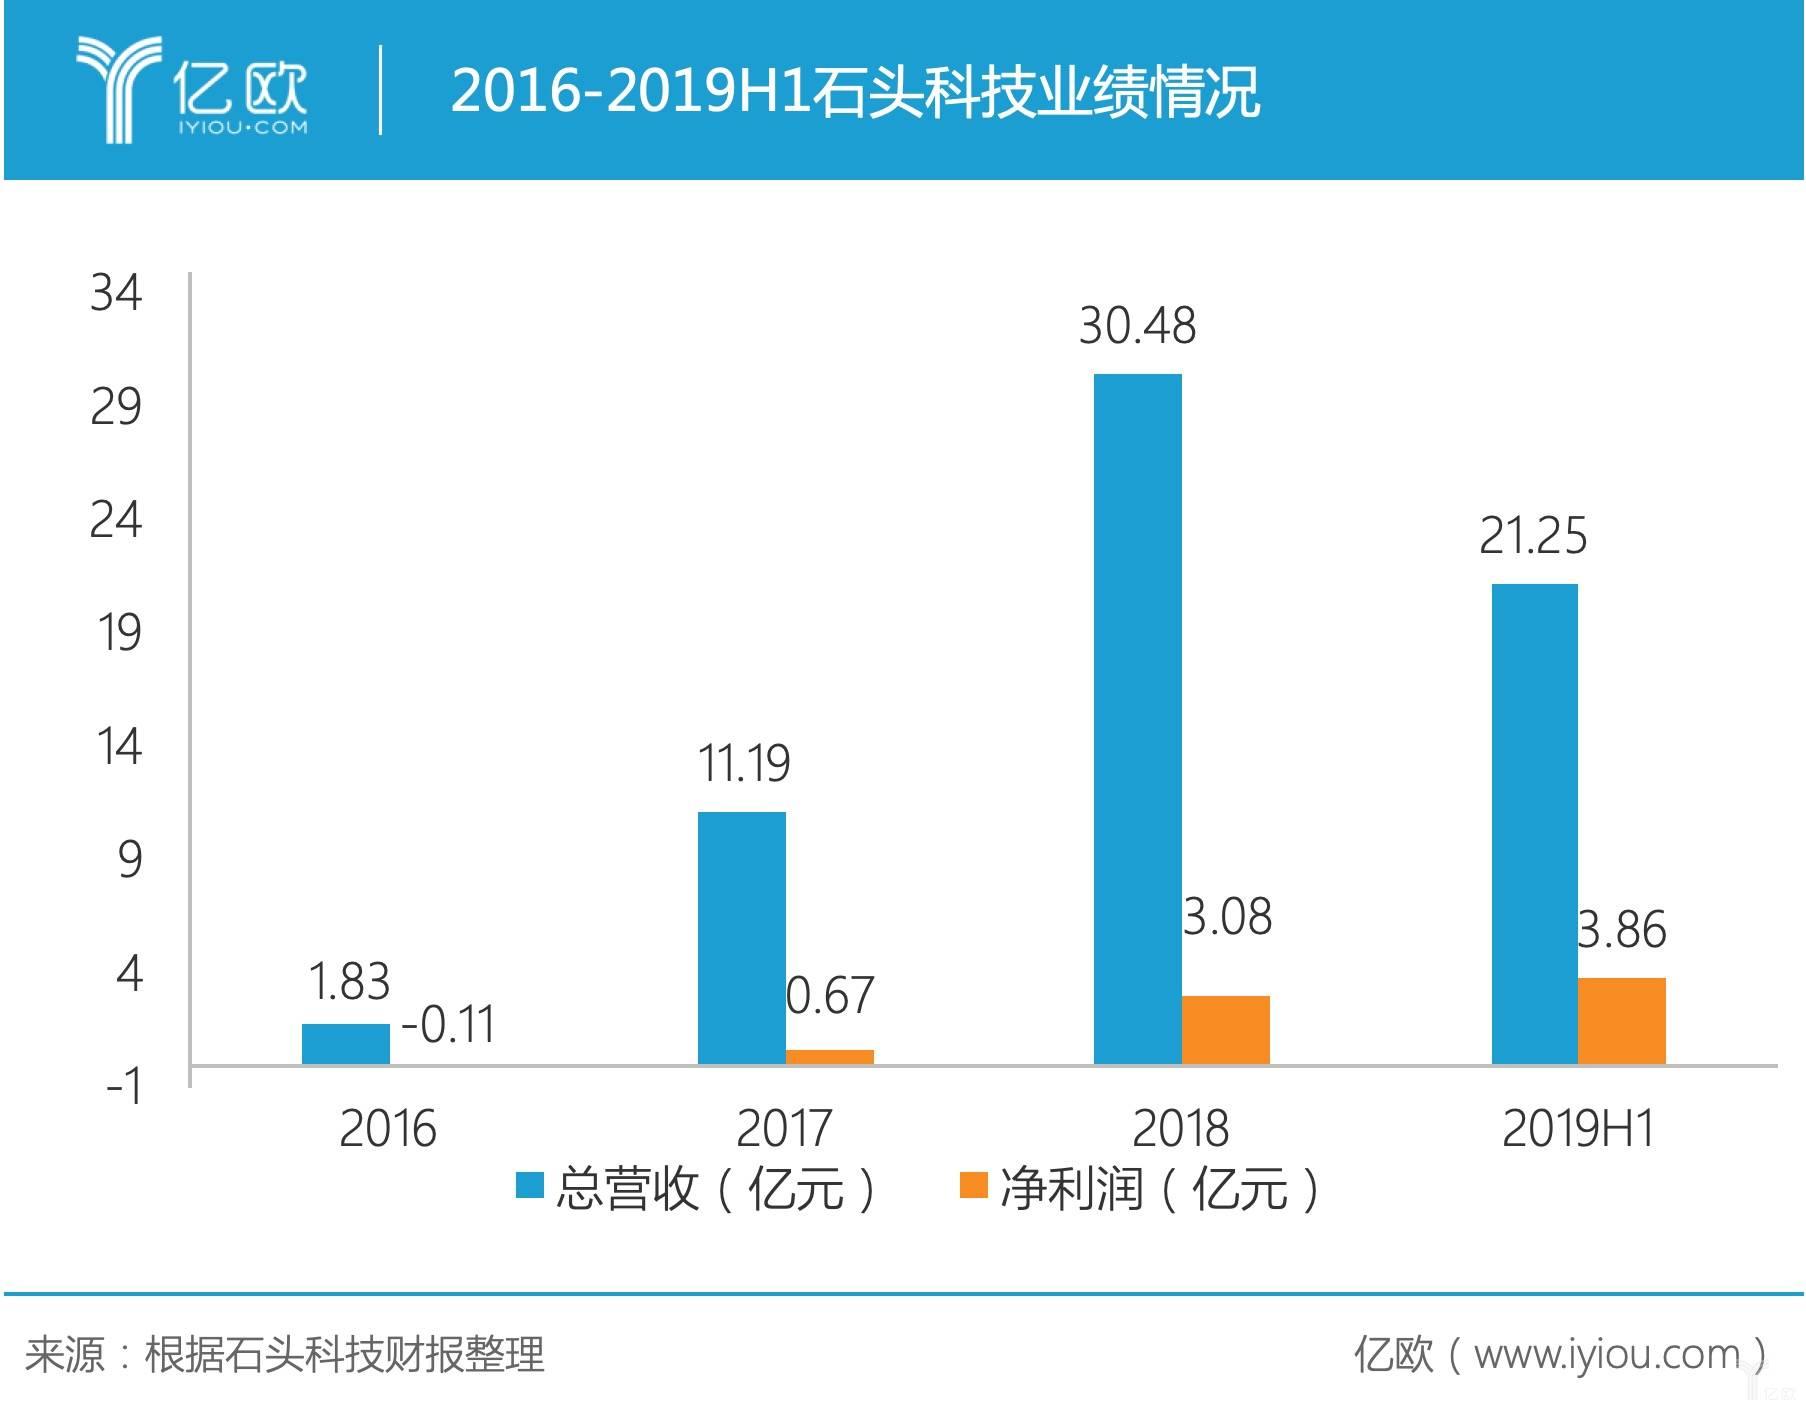 2016-2019H1石头科技业绩情况